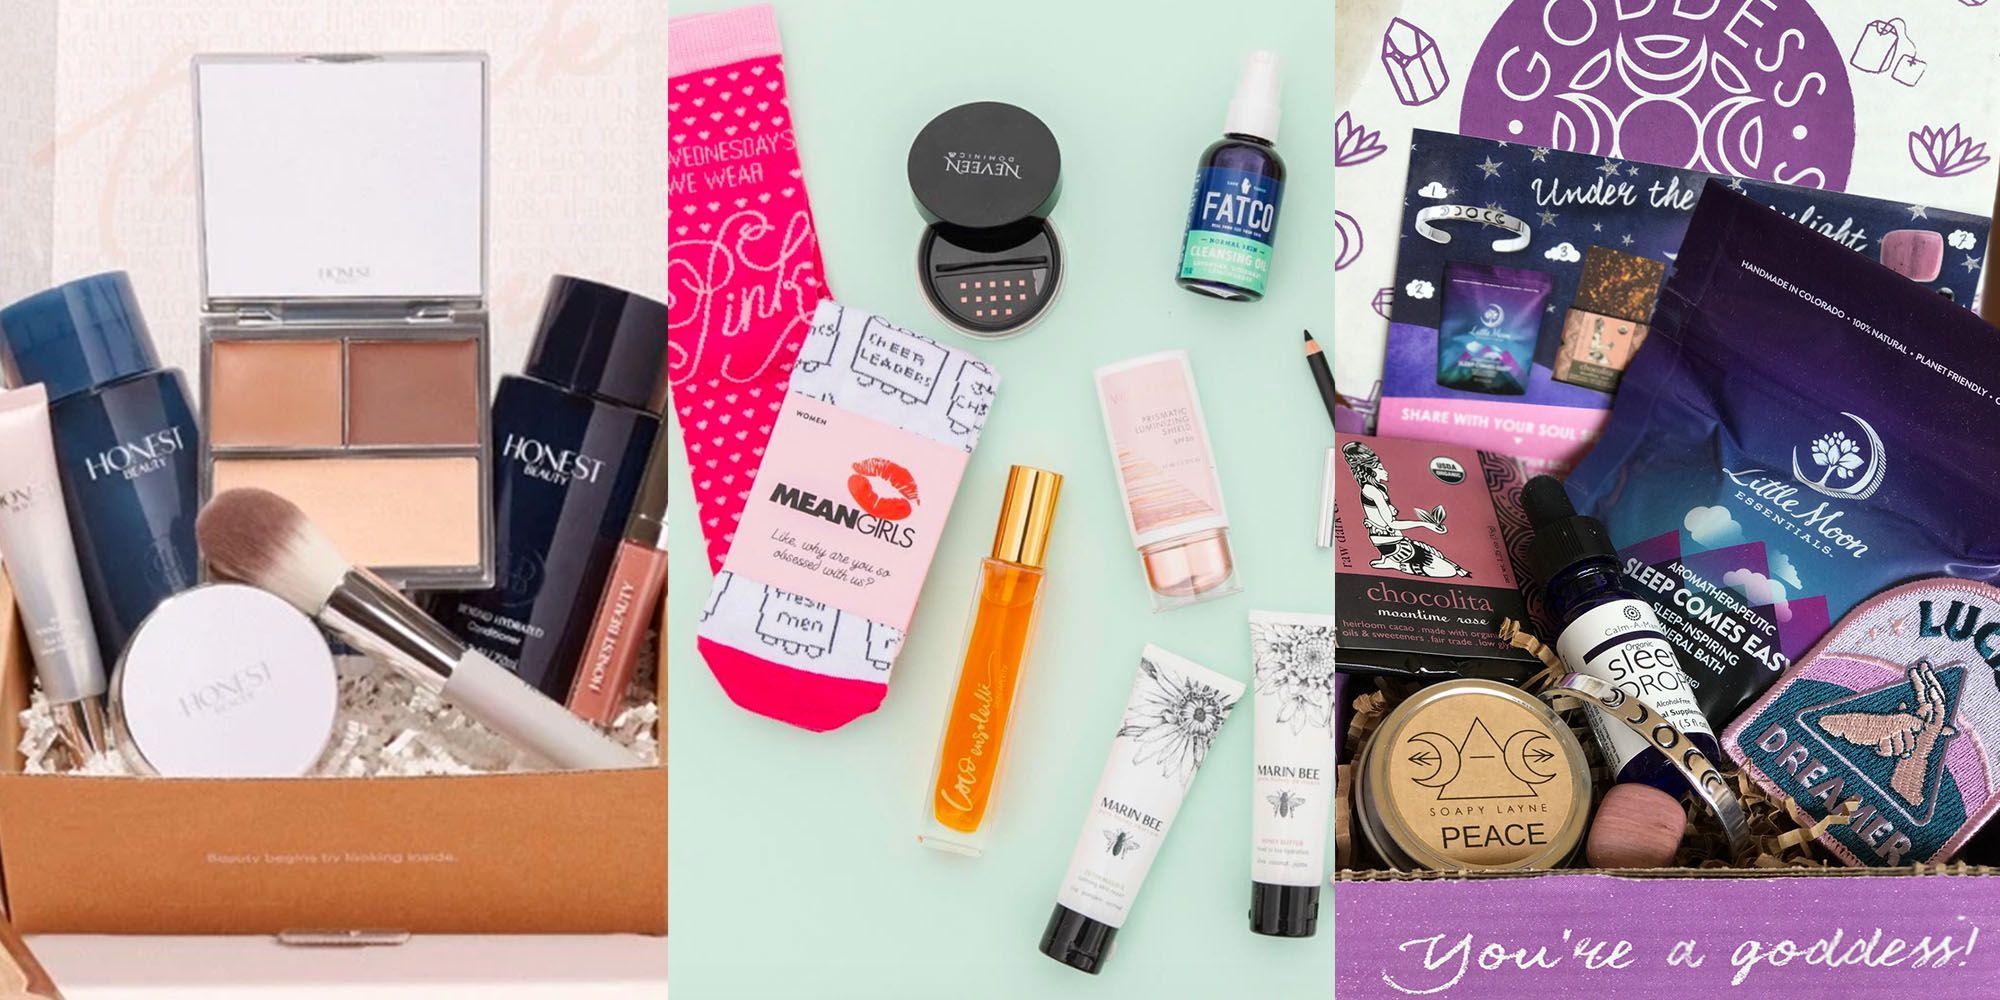 Pro beauty kits